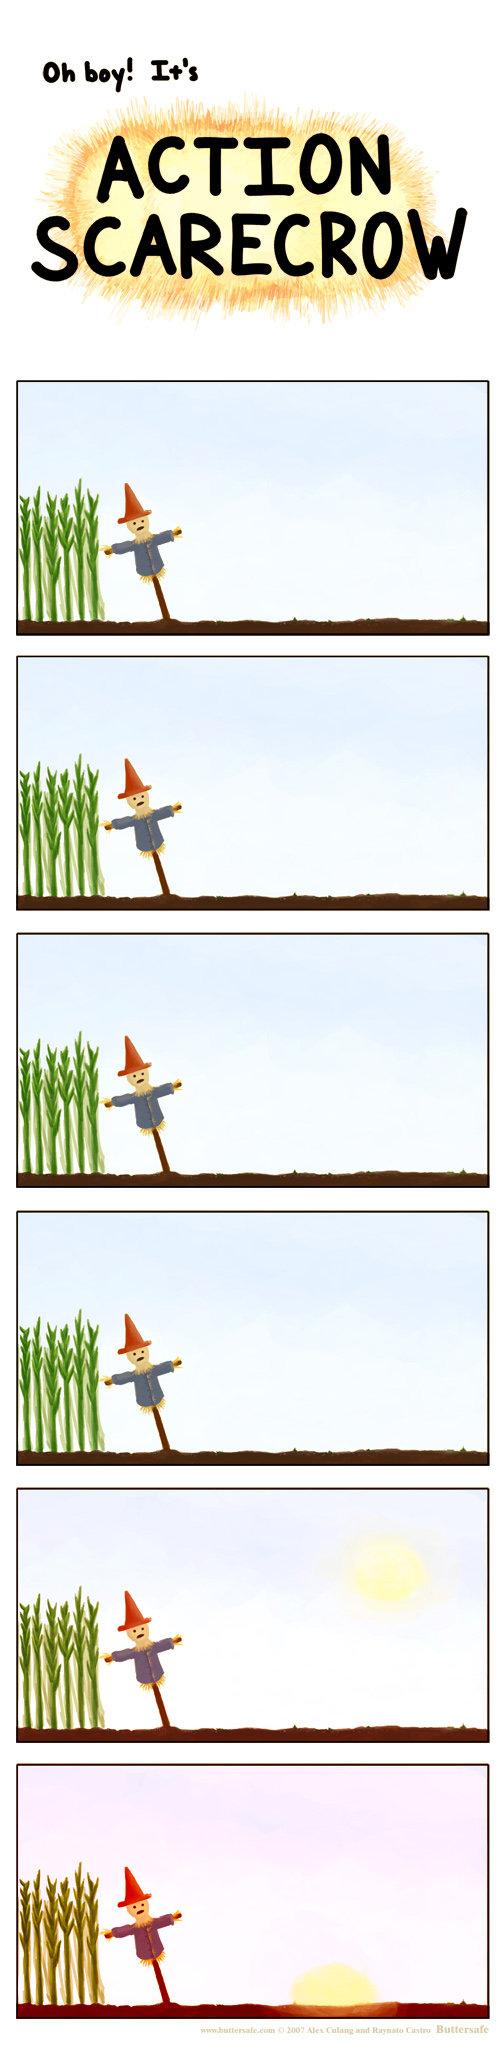 Action Scarecrow. Check tags. SCARECROW. SO BRUTAL!!